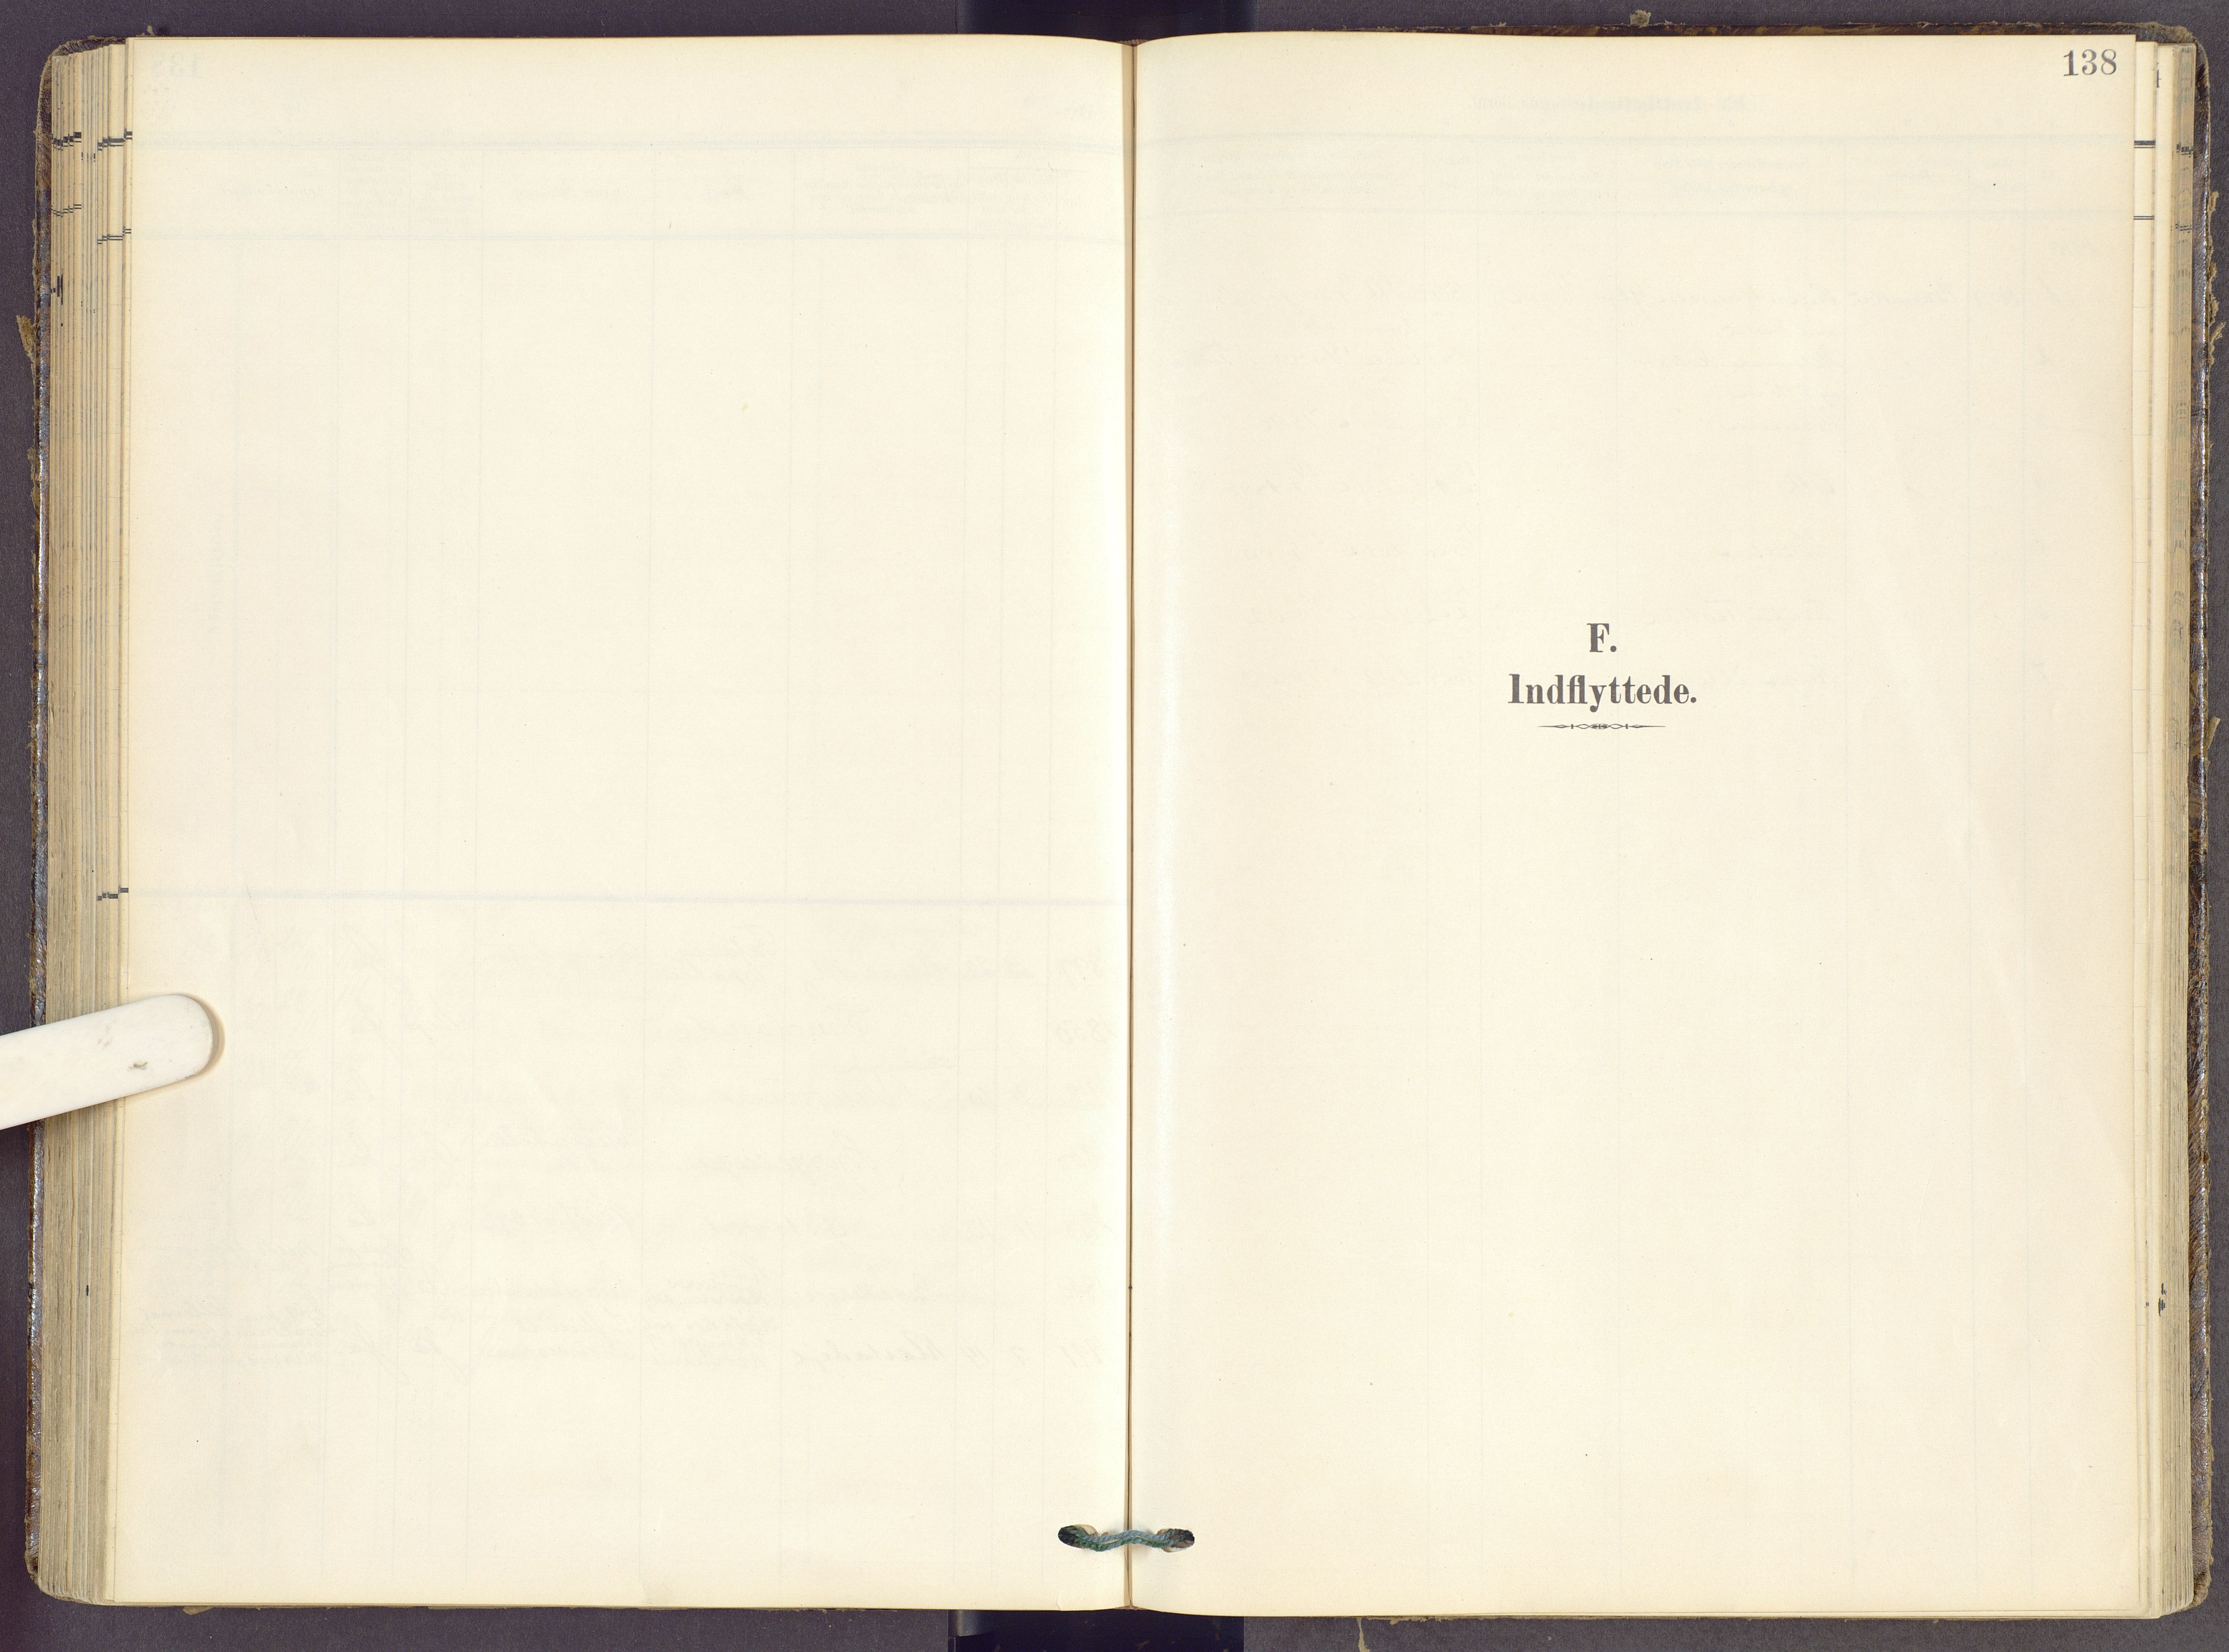 SAH, Gran prestekontor, Ministerialbok nr. 22, 1908-1918, s. 138